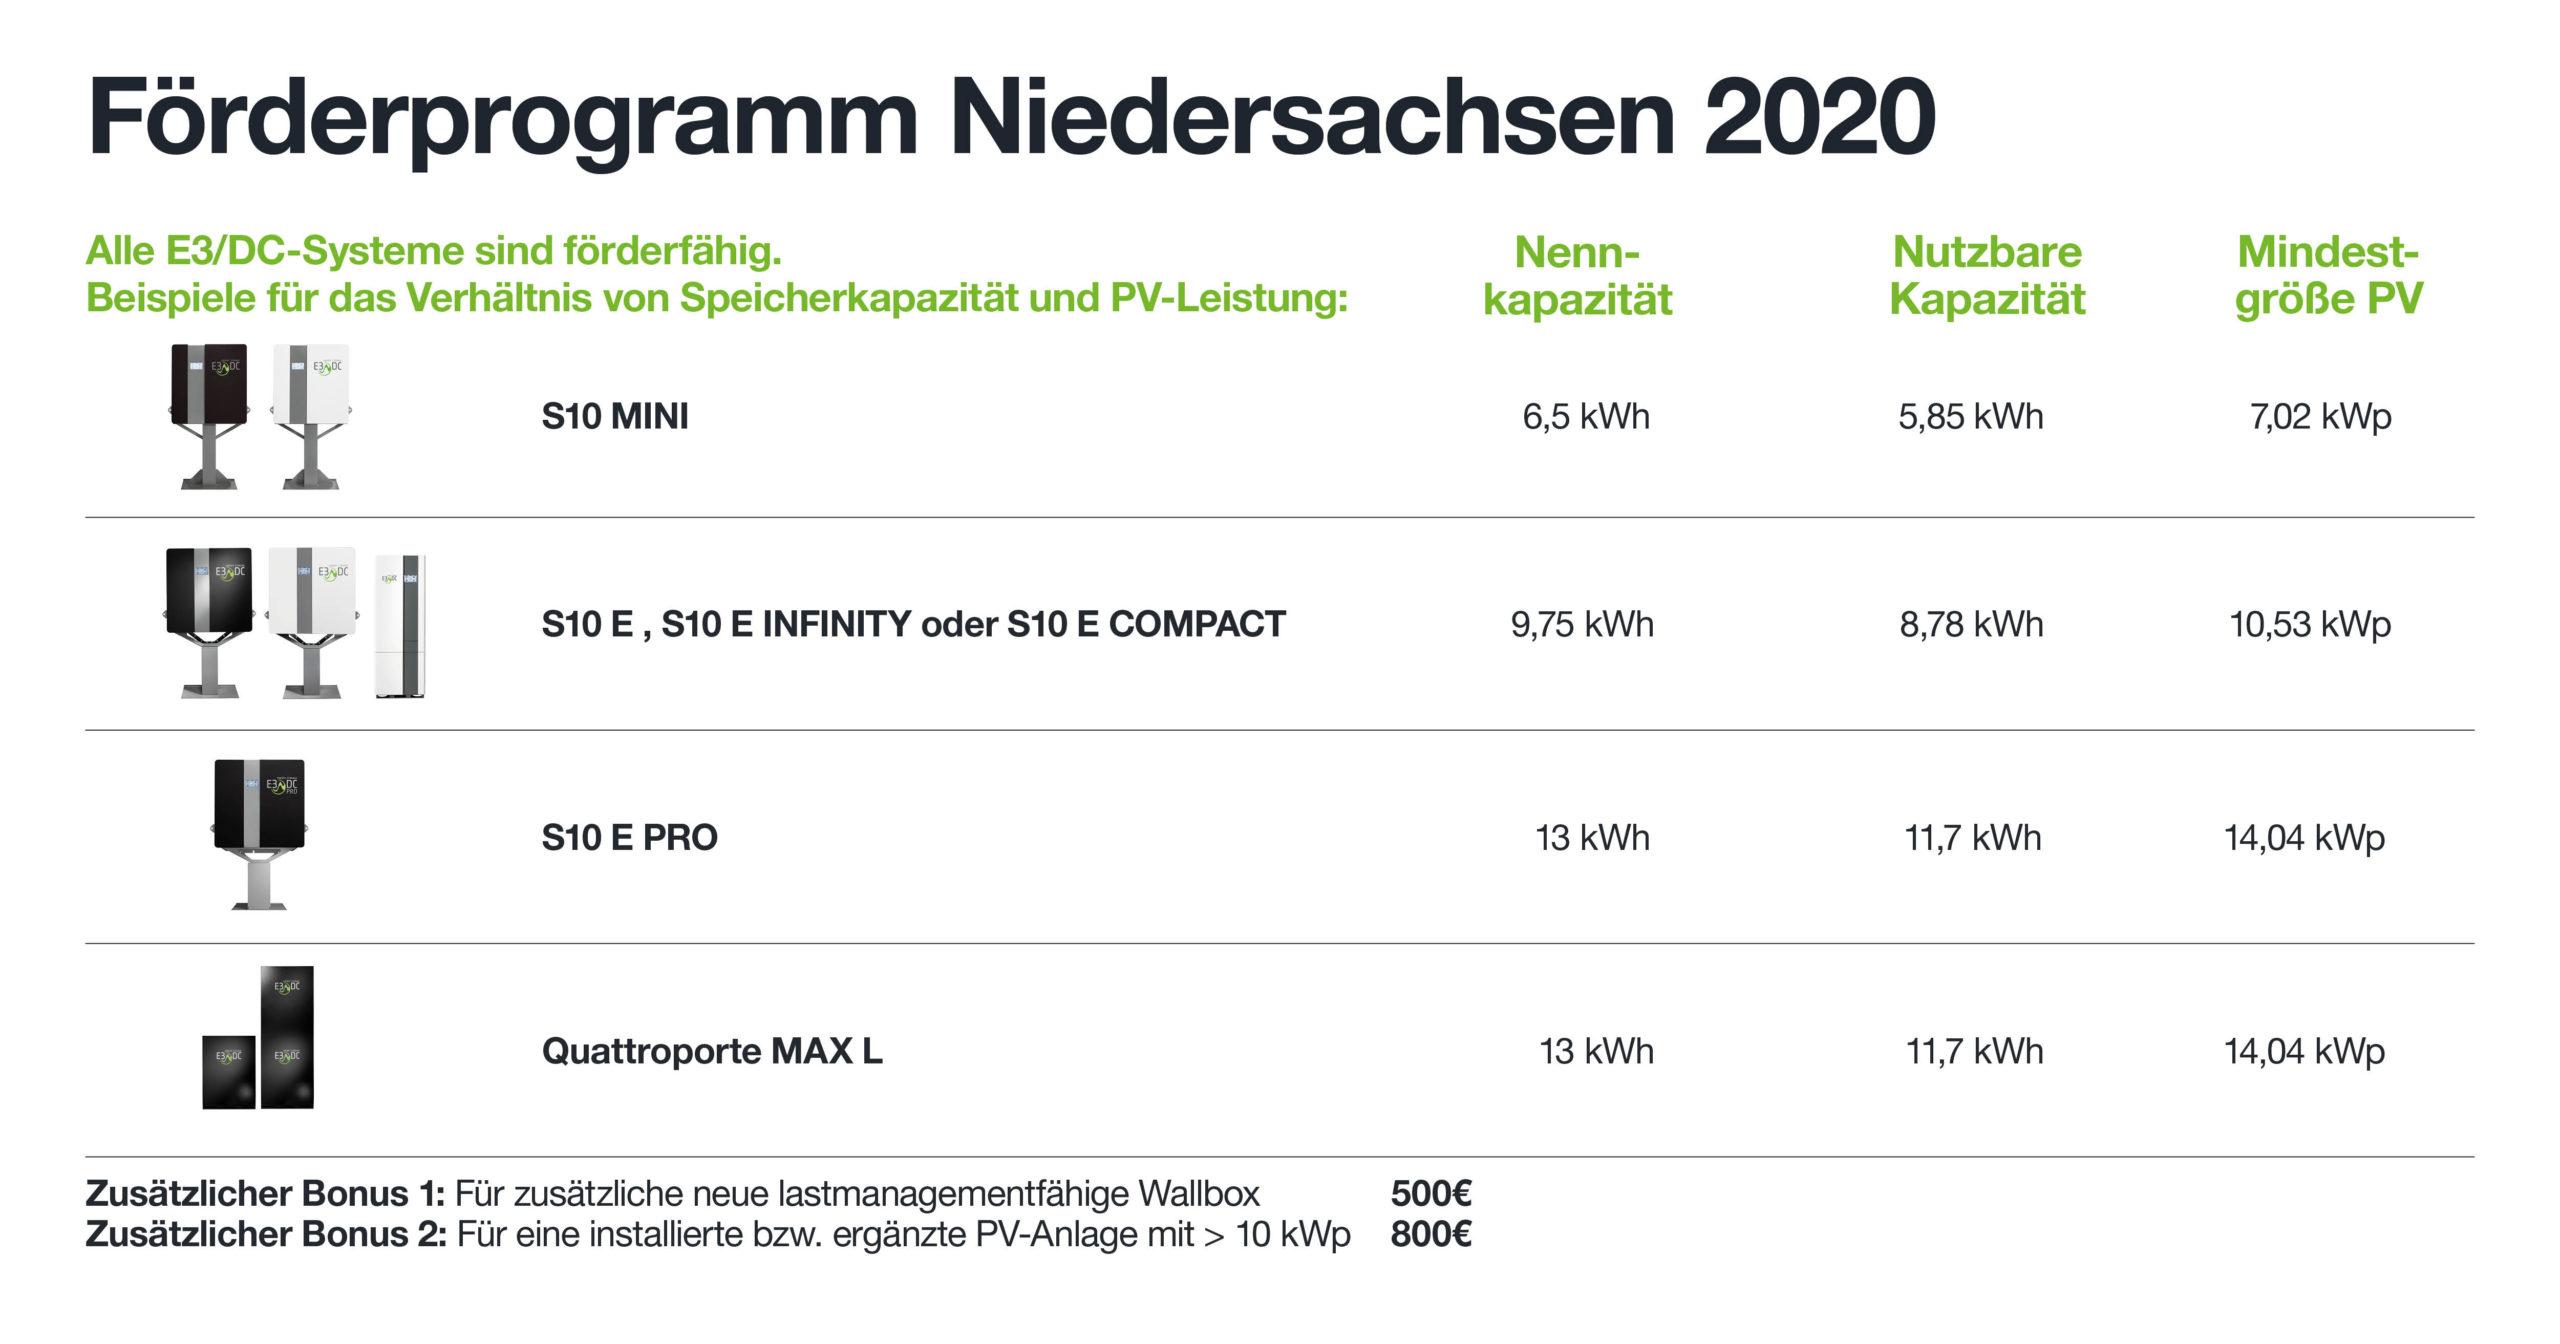 Niedersachsen fördert Hauskraftwerke